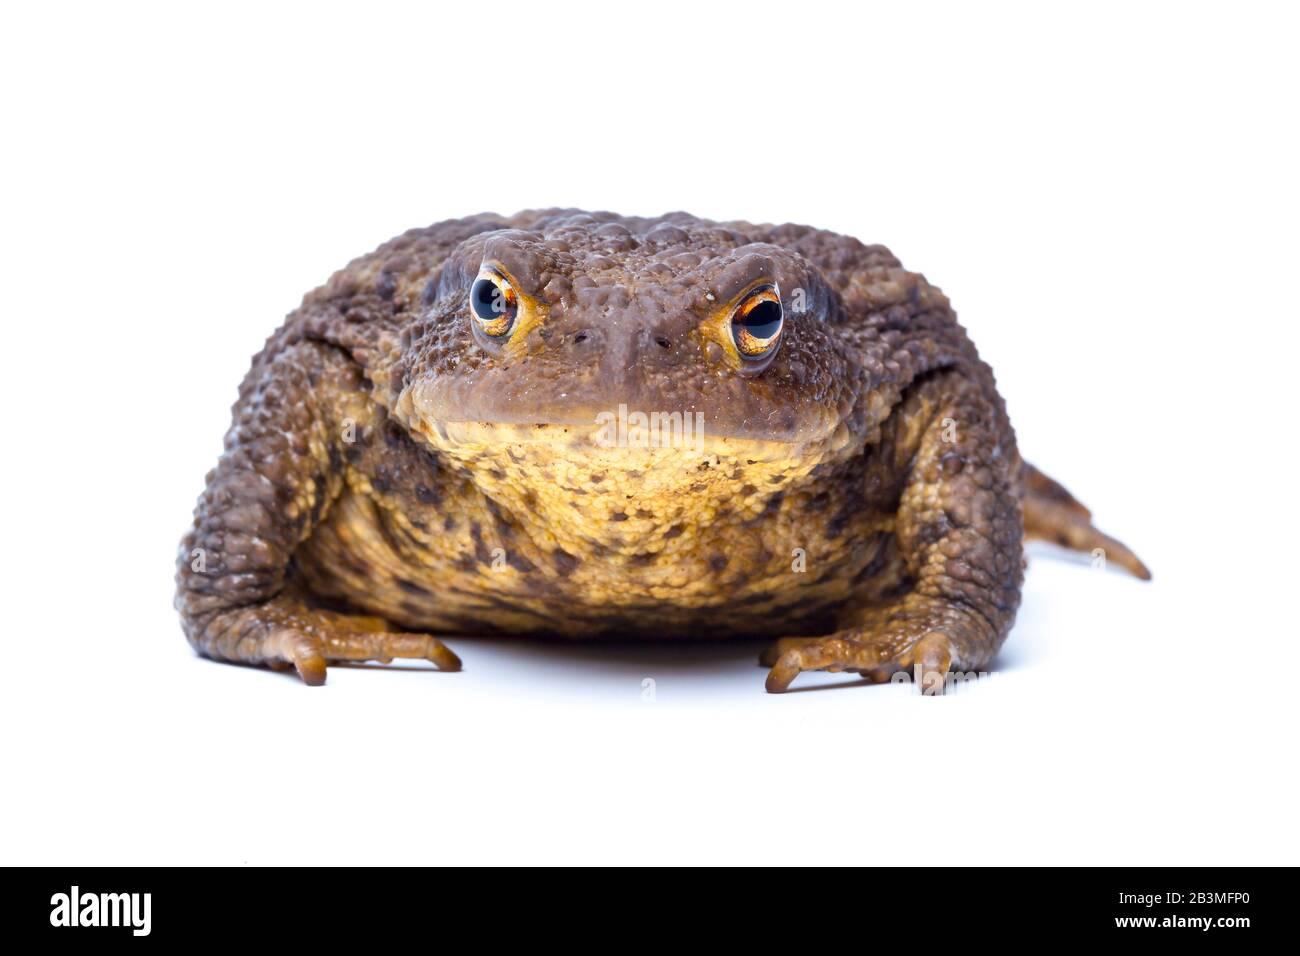 European Common Toad, Bufo bufo Stock Photo